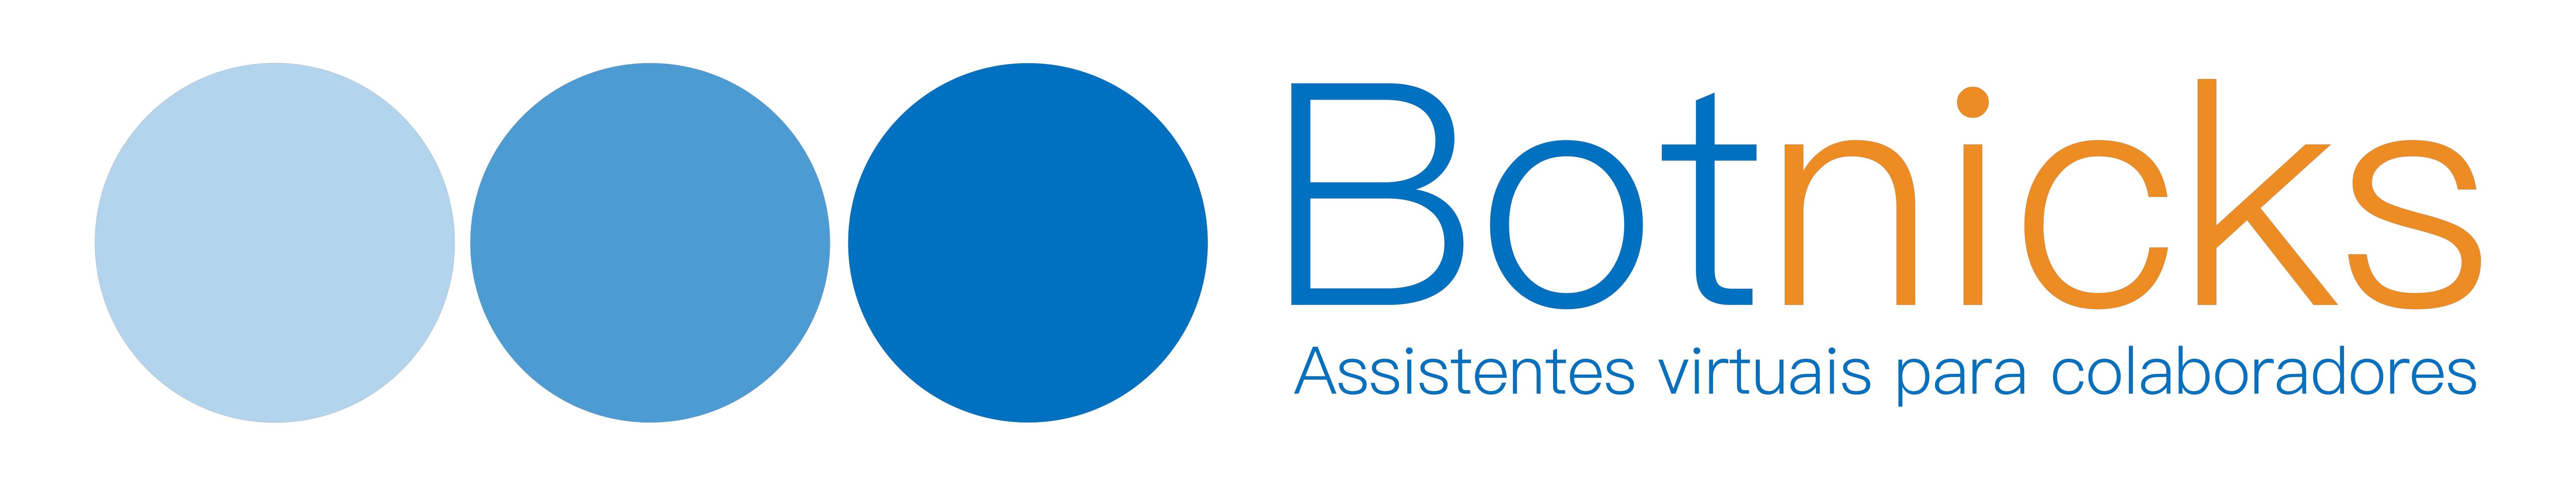 Logo Botnicks | Onboarding digital de colaboradores